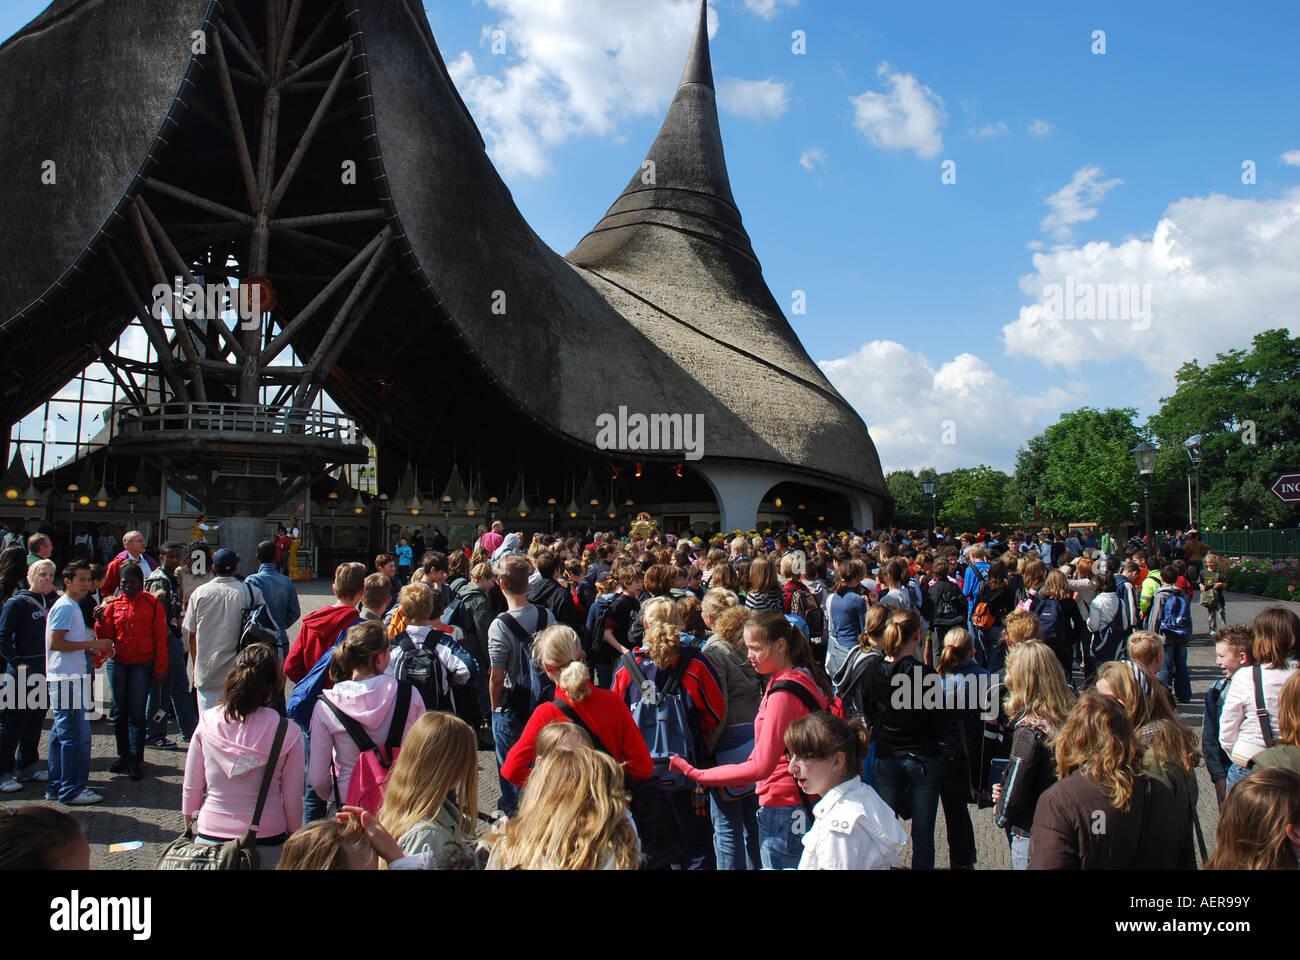 Visitors waiting at entrance to efteling theme park for Amusement park netherlands